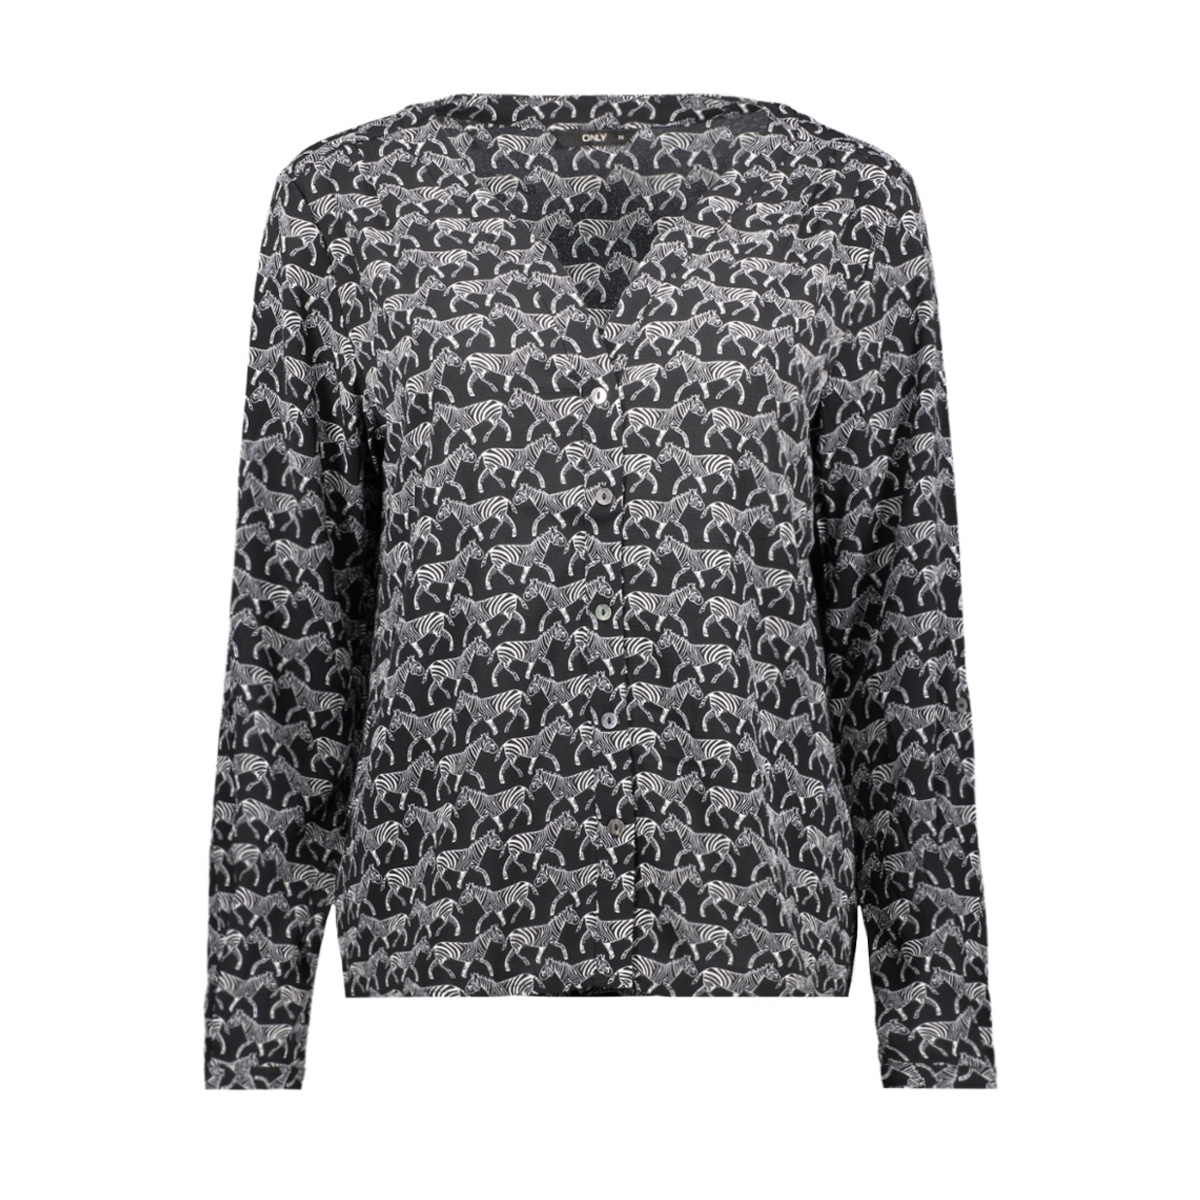 onlnova lux aop v-neck placket shirt 4 w 15172745 only blouse black/zebra